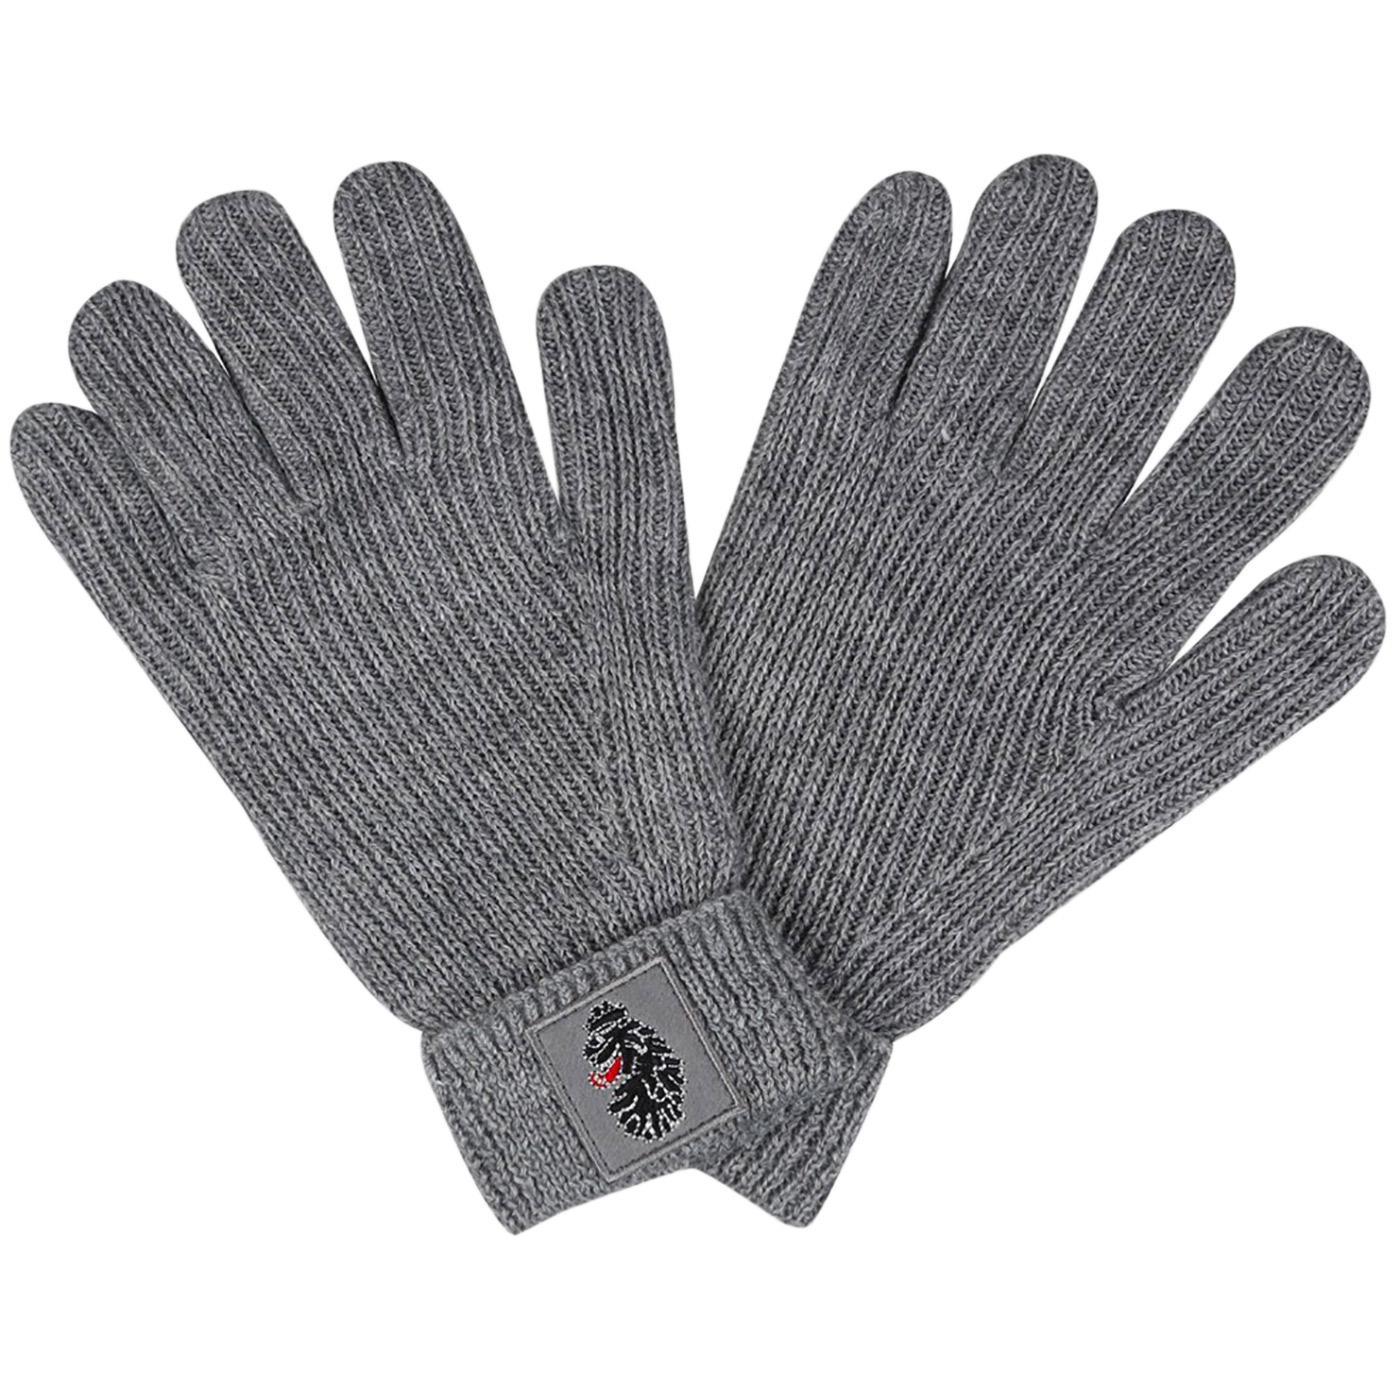 Milo LUKE Retro Knitted Fleece Lined Gloves (Grey)